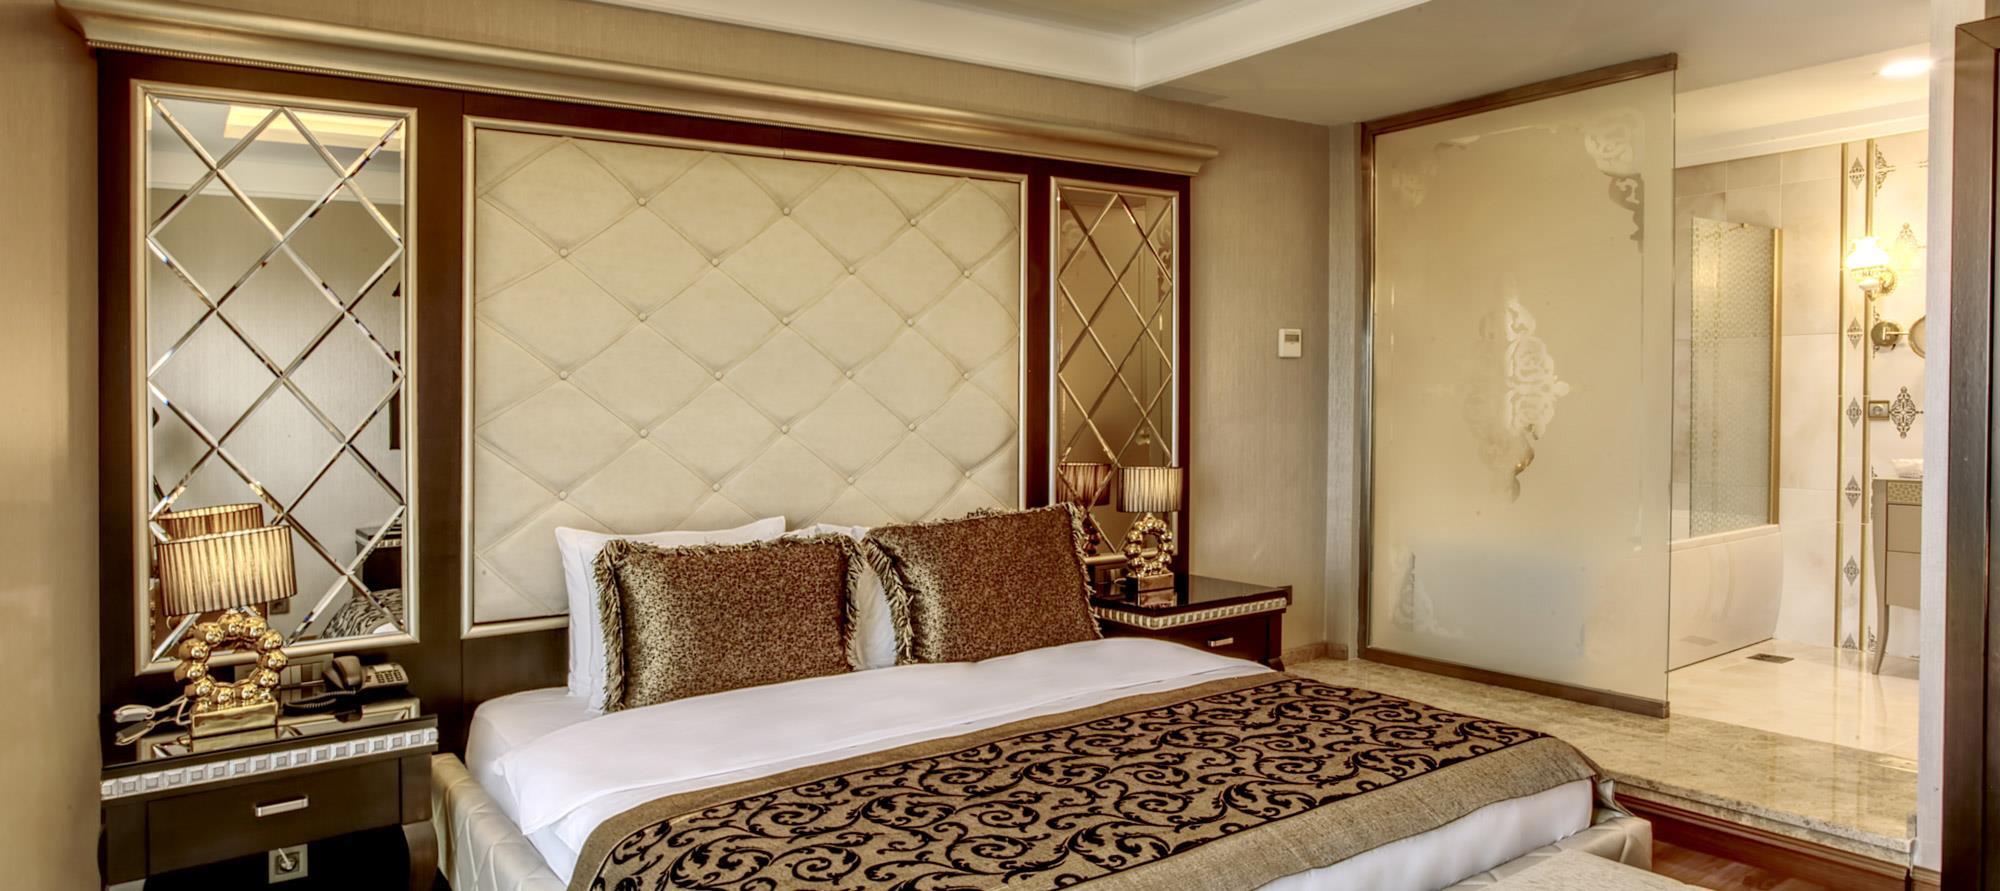 Grand Makel Hotel Topkapi254611